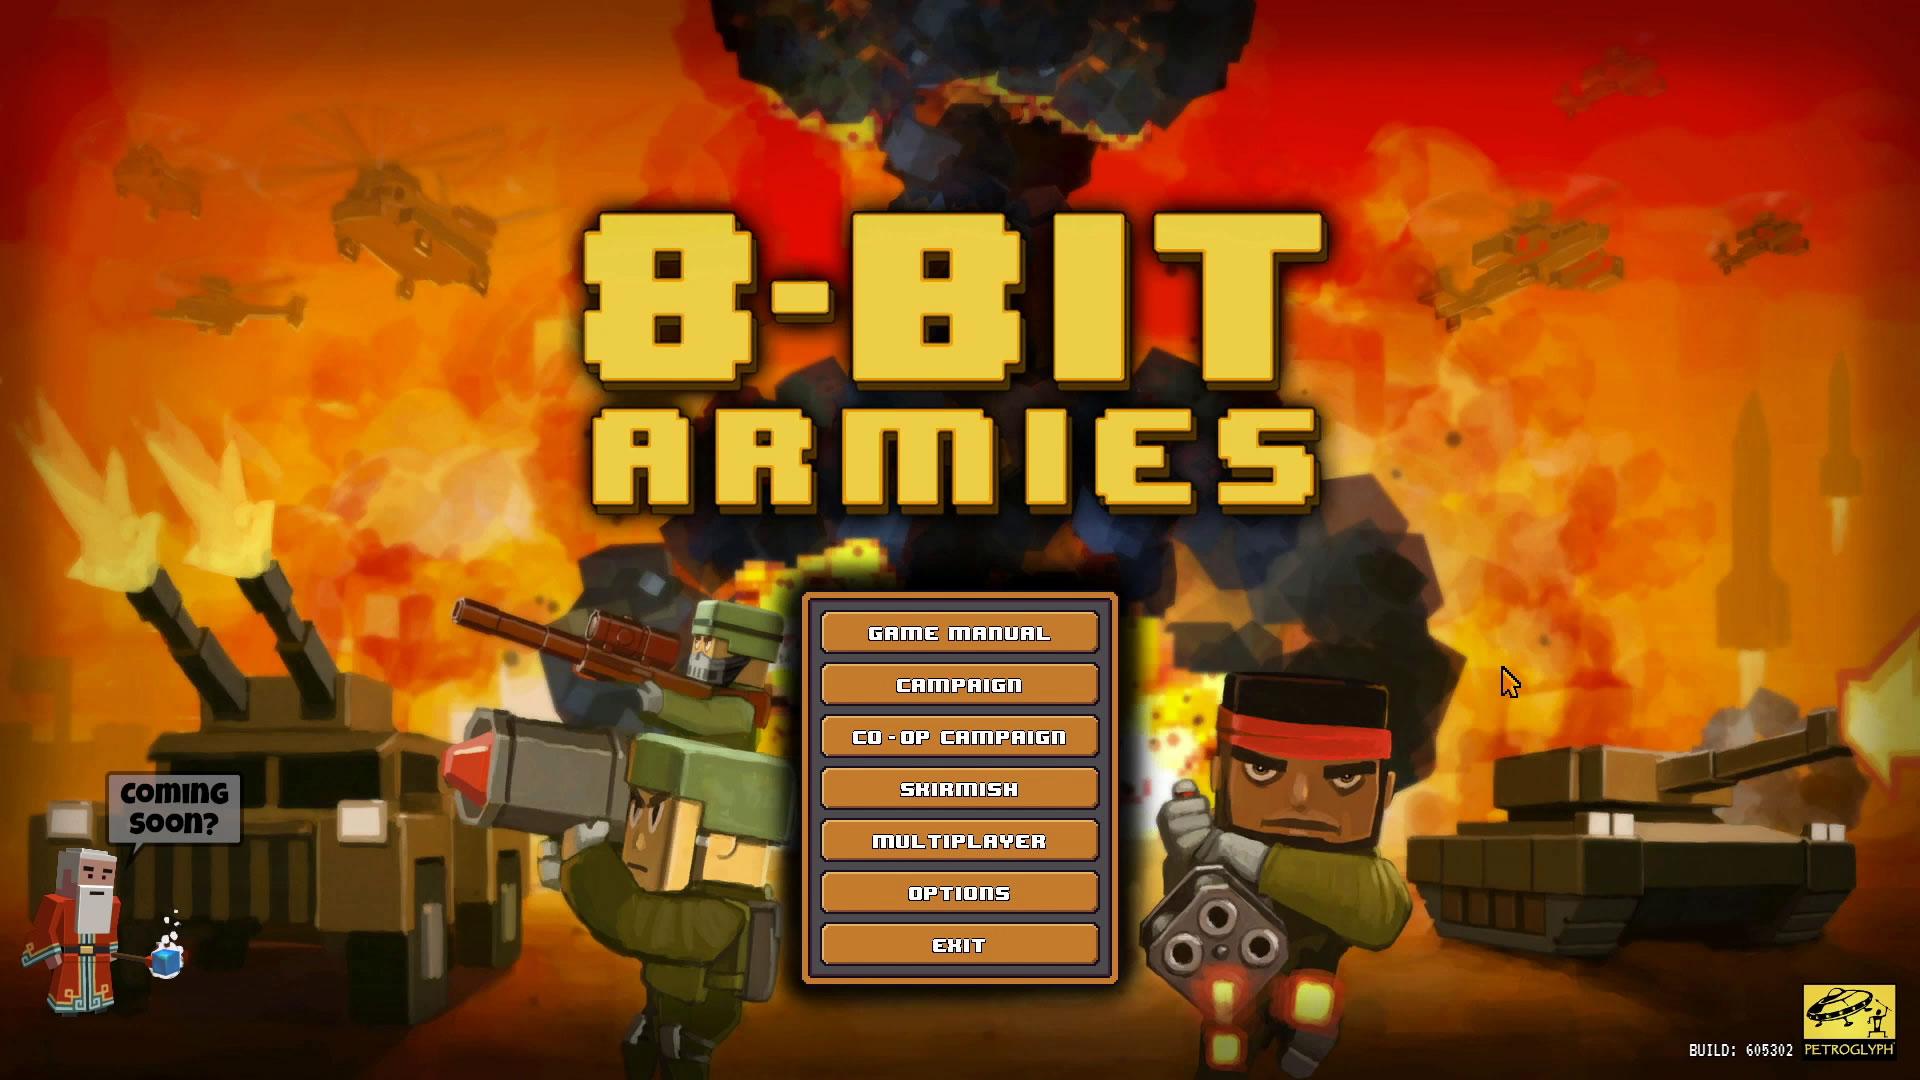 8-Bit Armies – Let's Play: BETA Singleplayer Mission 1 – GREEN MAN